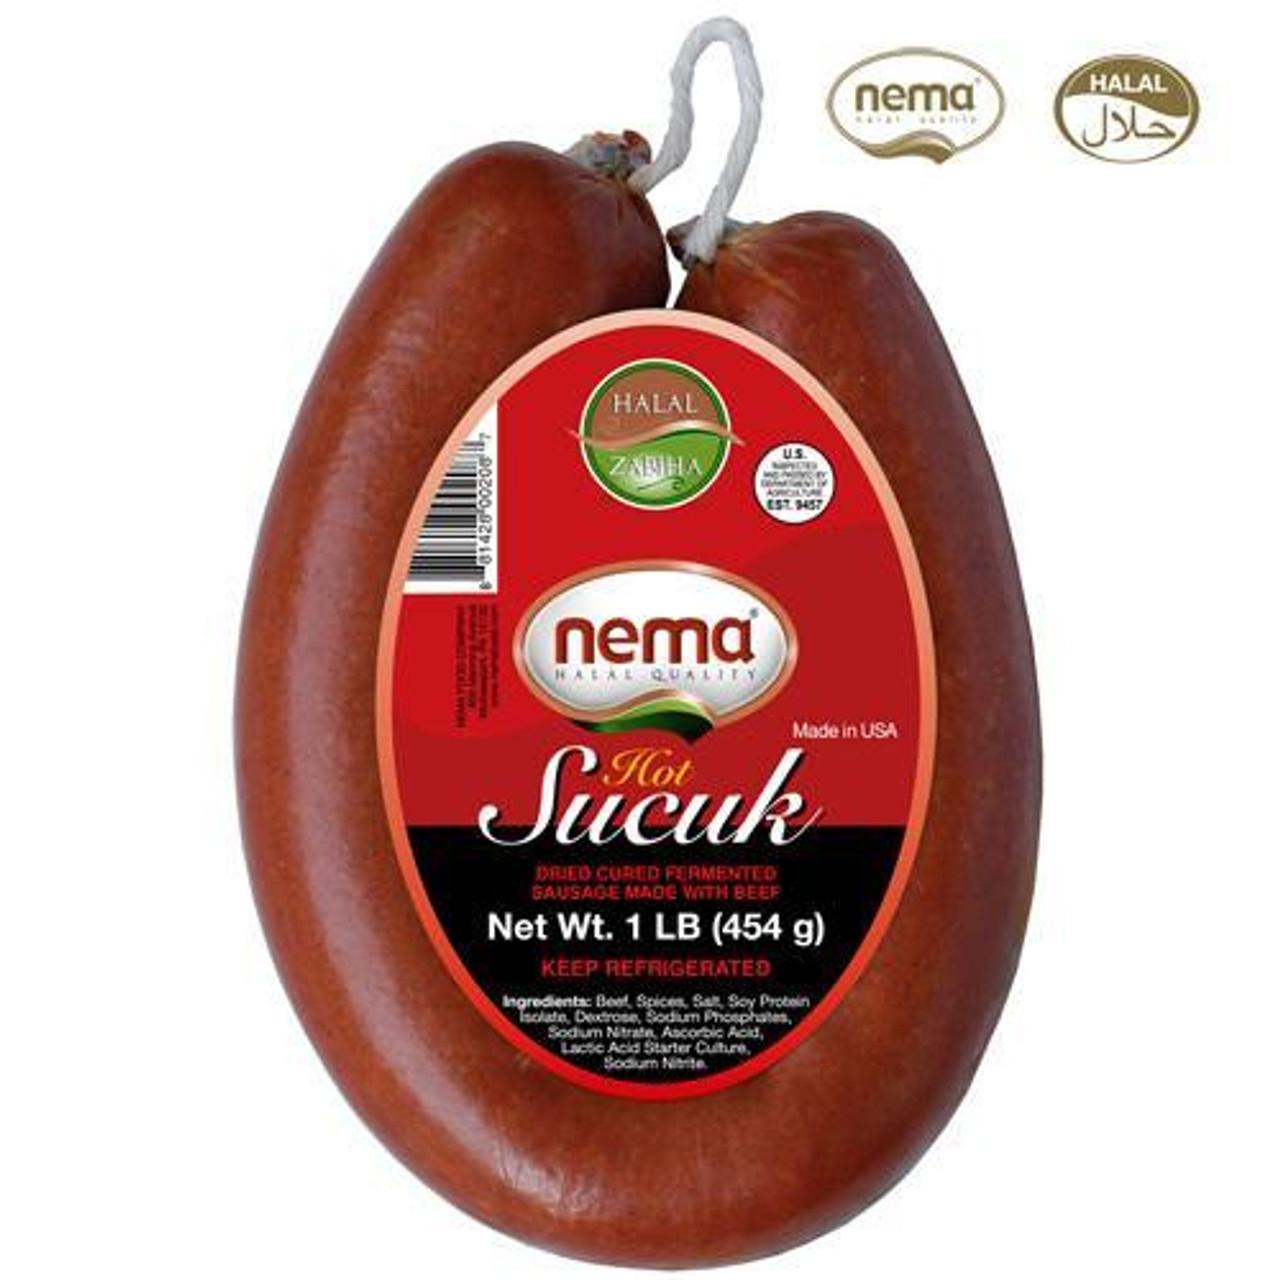 NEMA Hot Sucuk 1lb